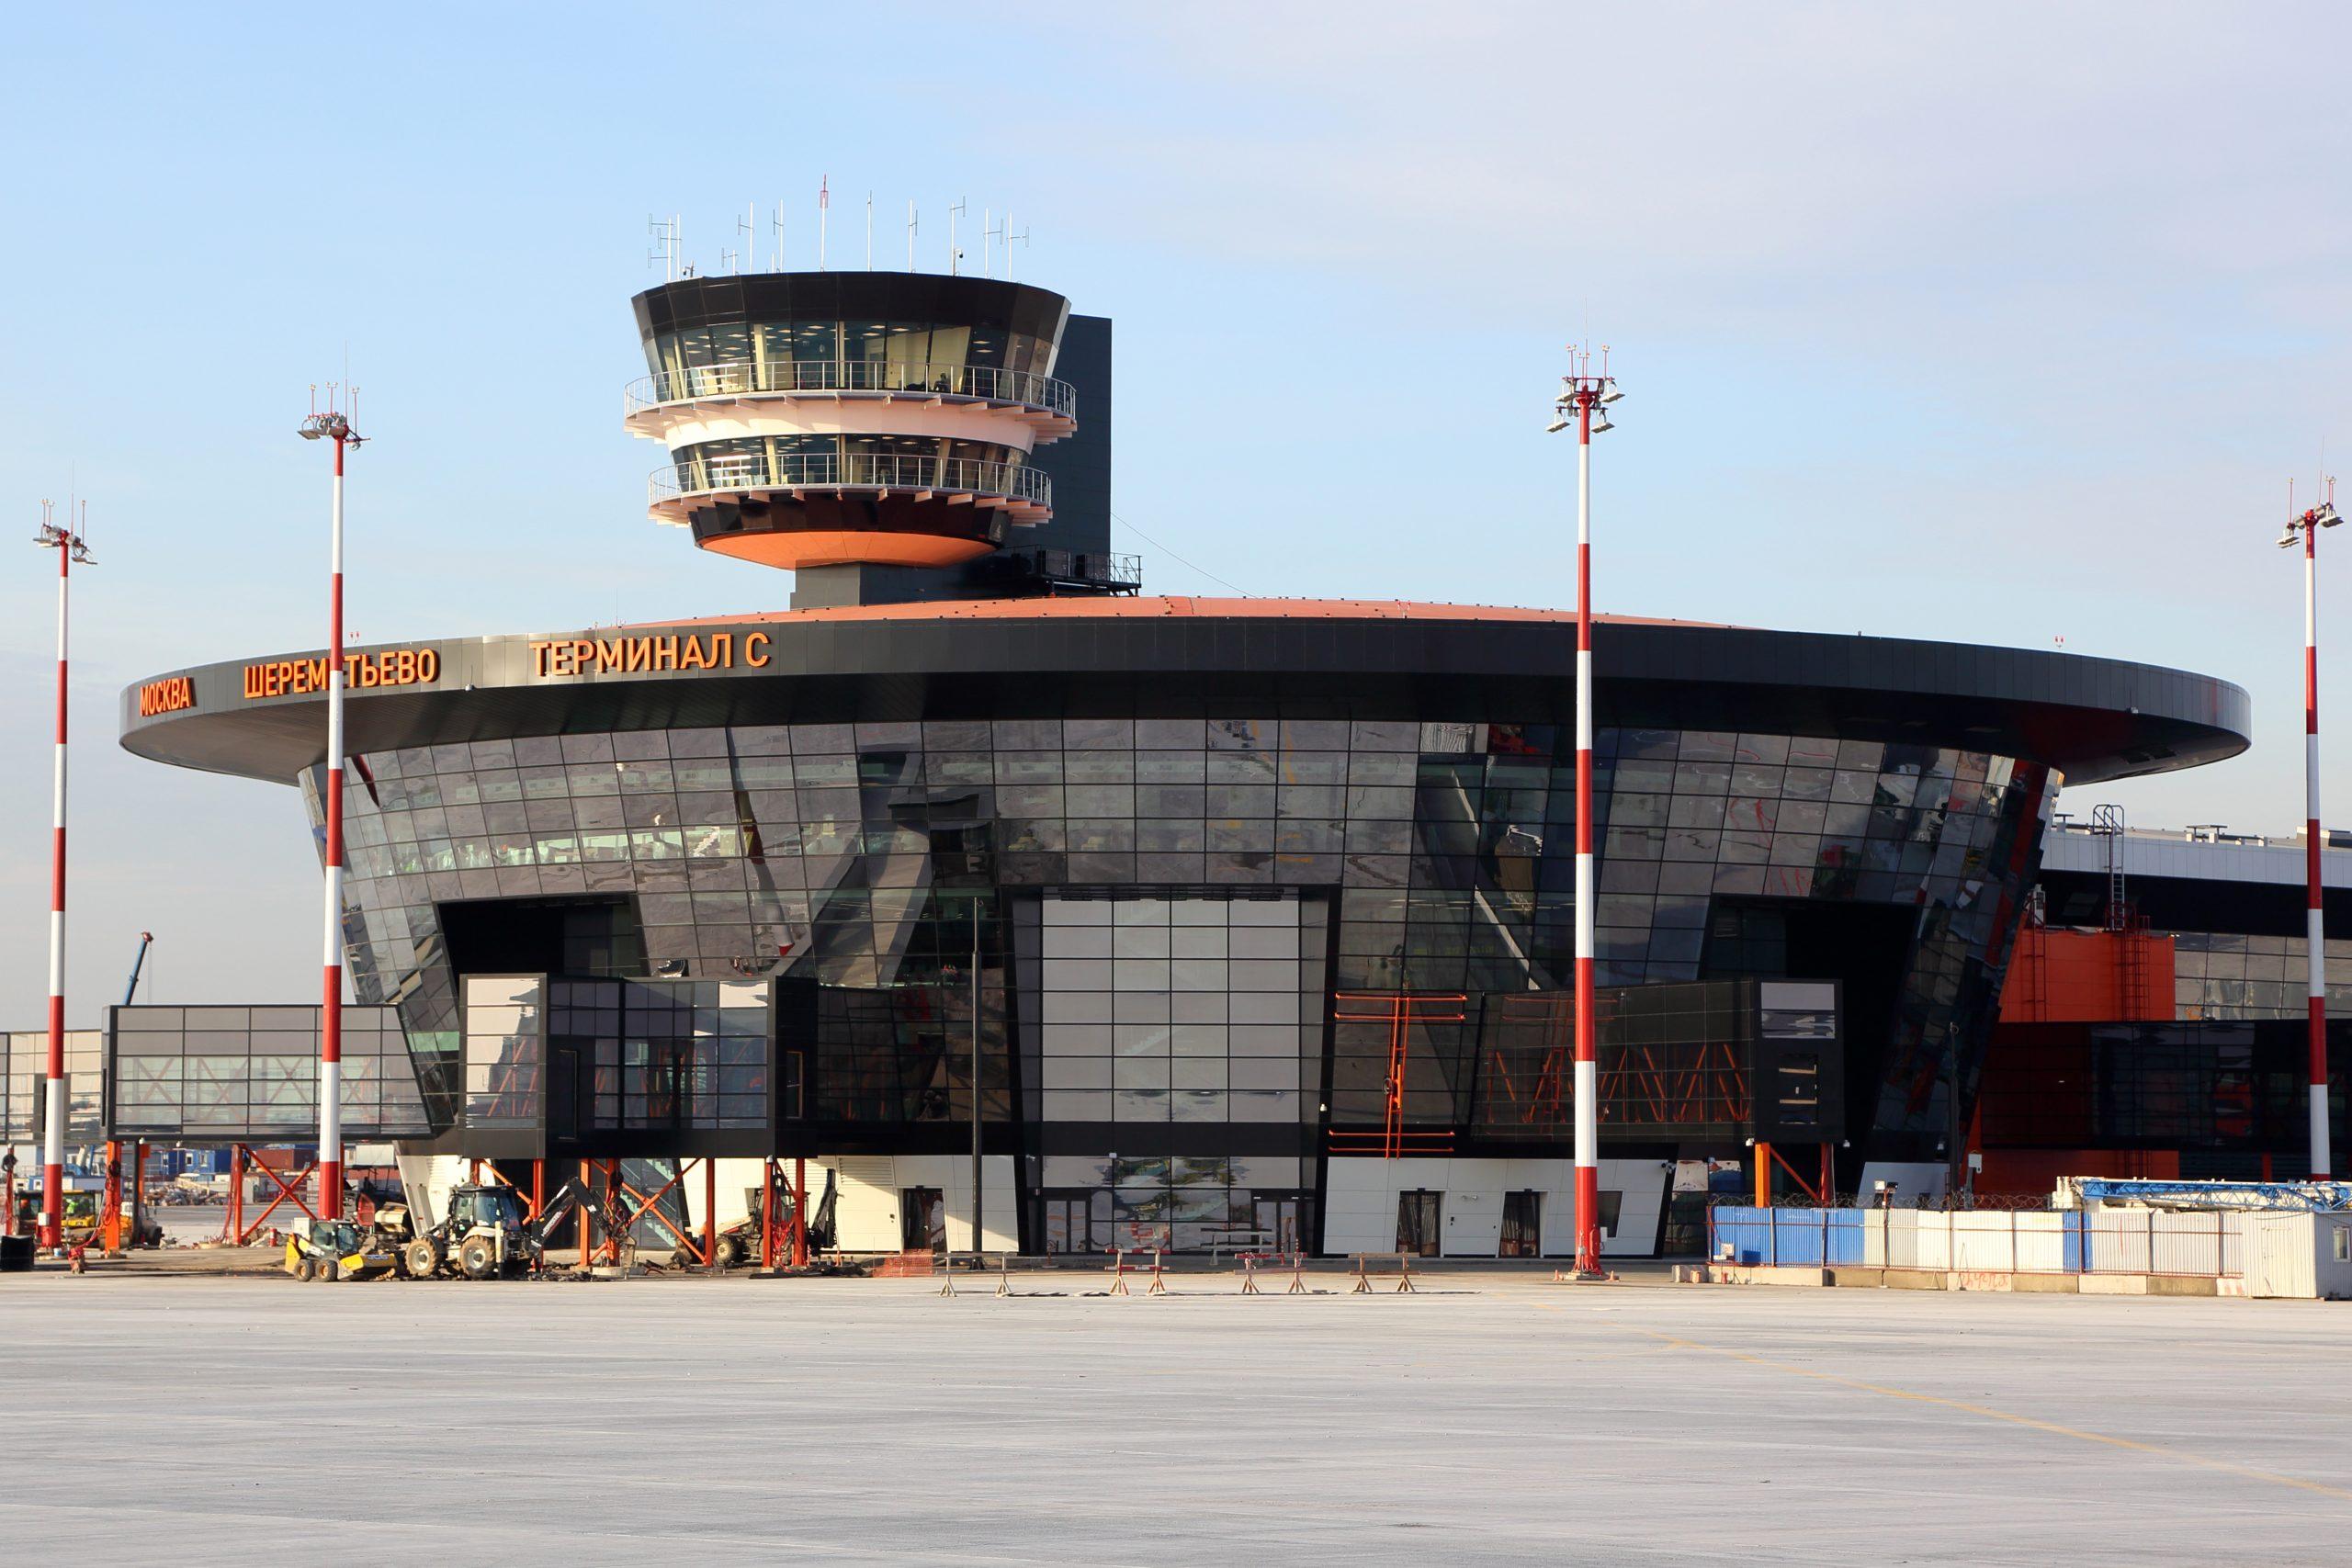 Sheremetyevo Terminal C1